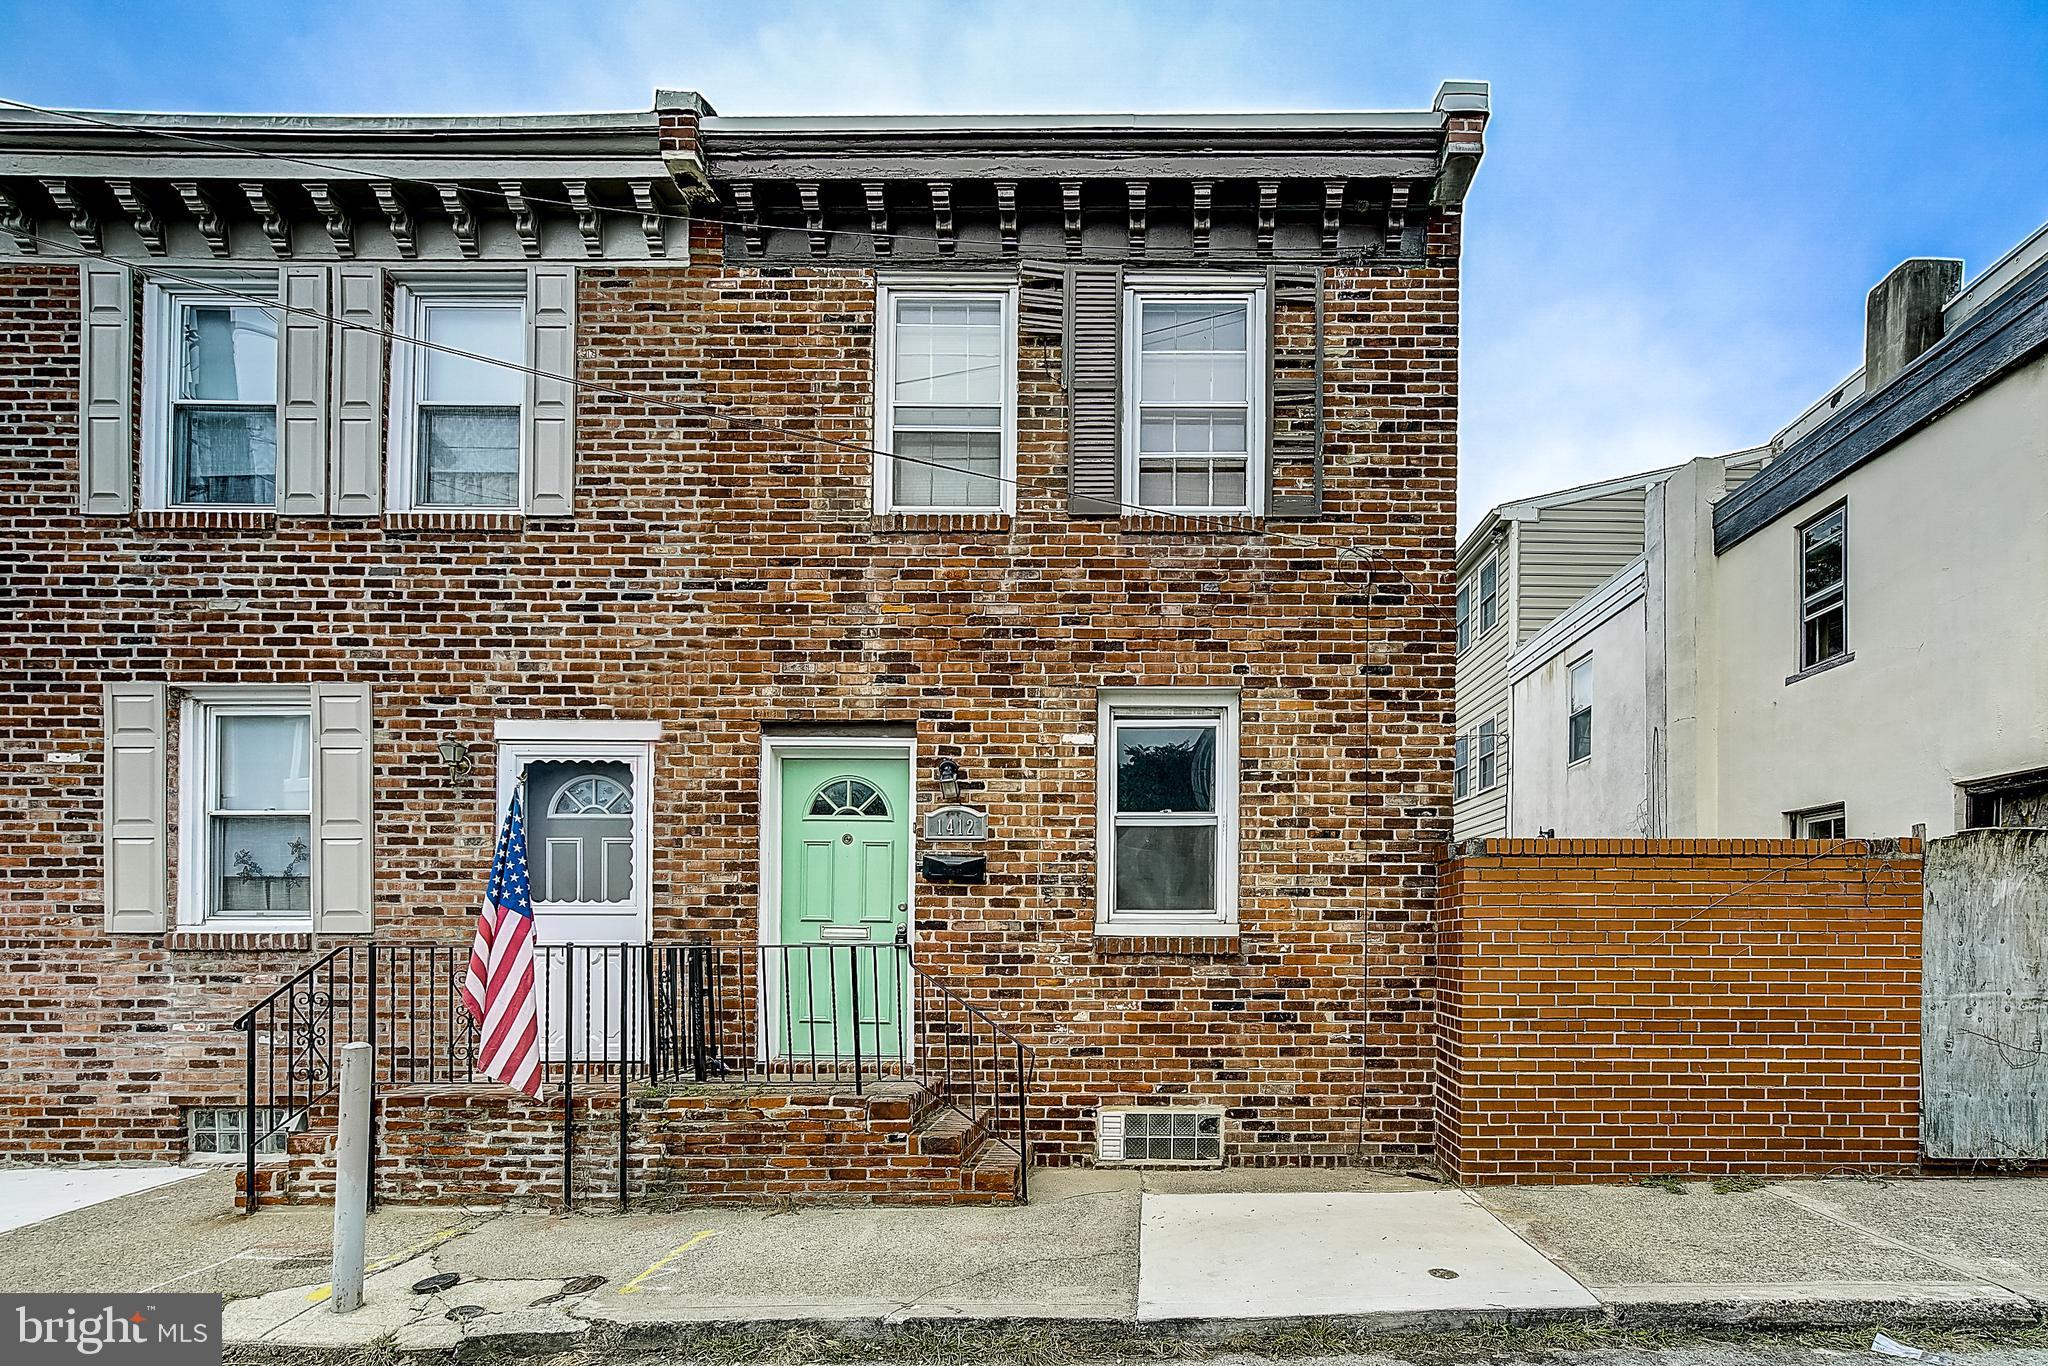 1412 E HEWSON STREET, PHILADELPHIA, PA 19125